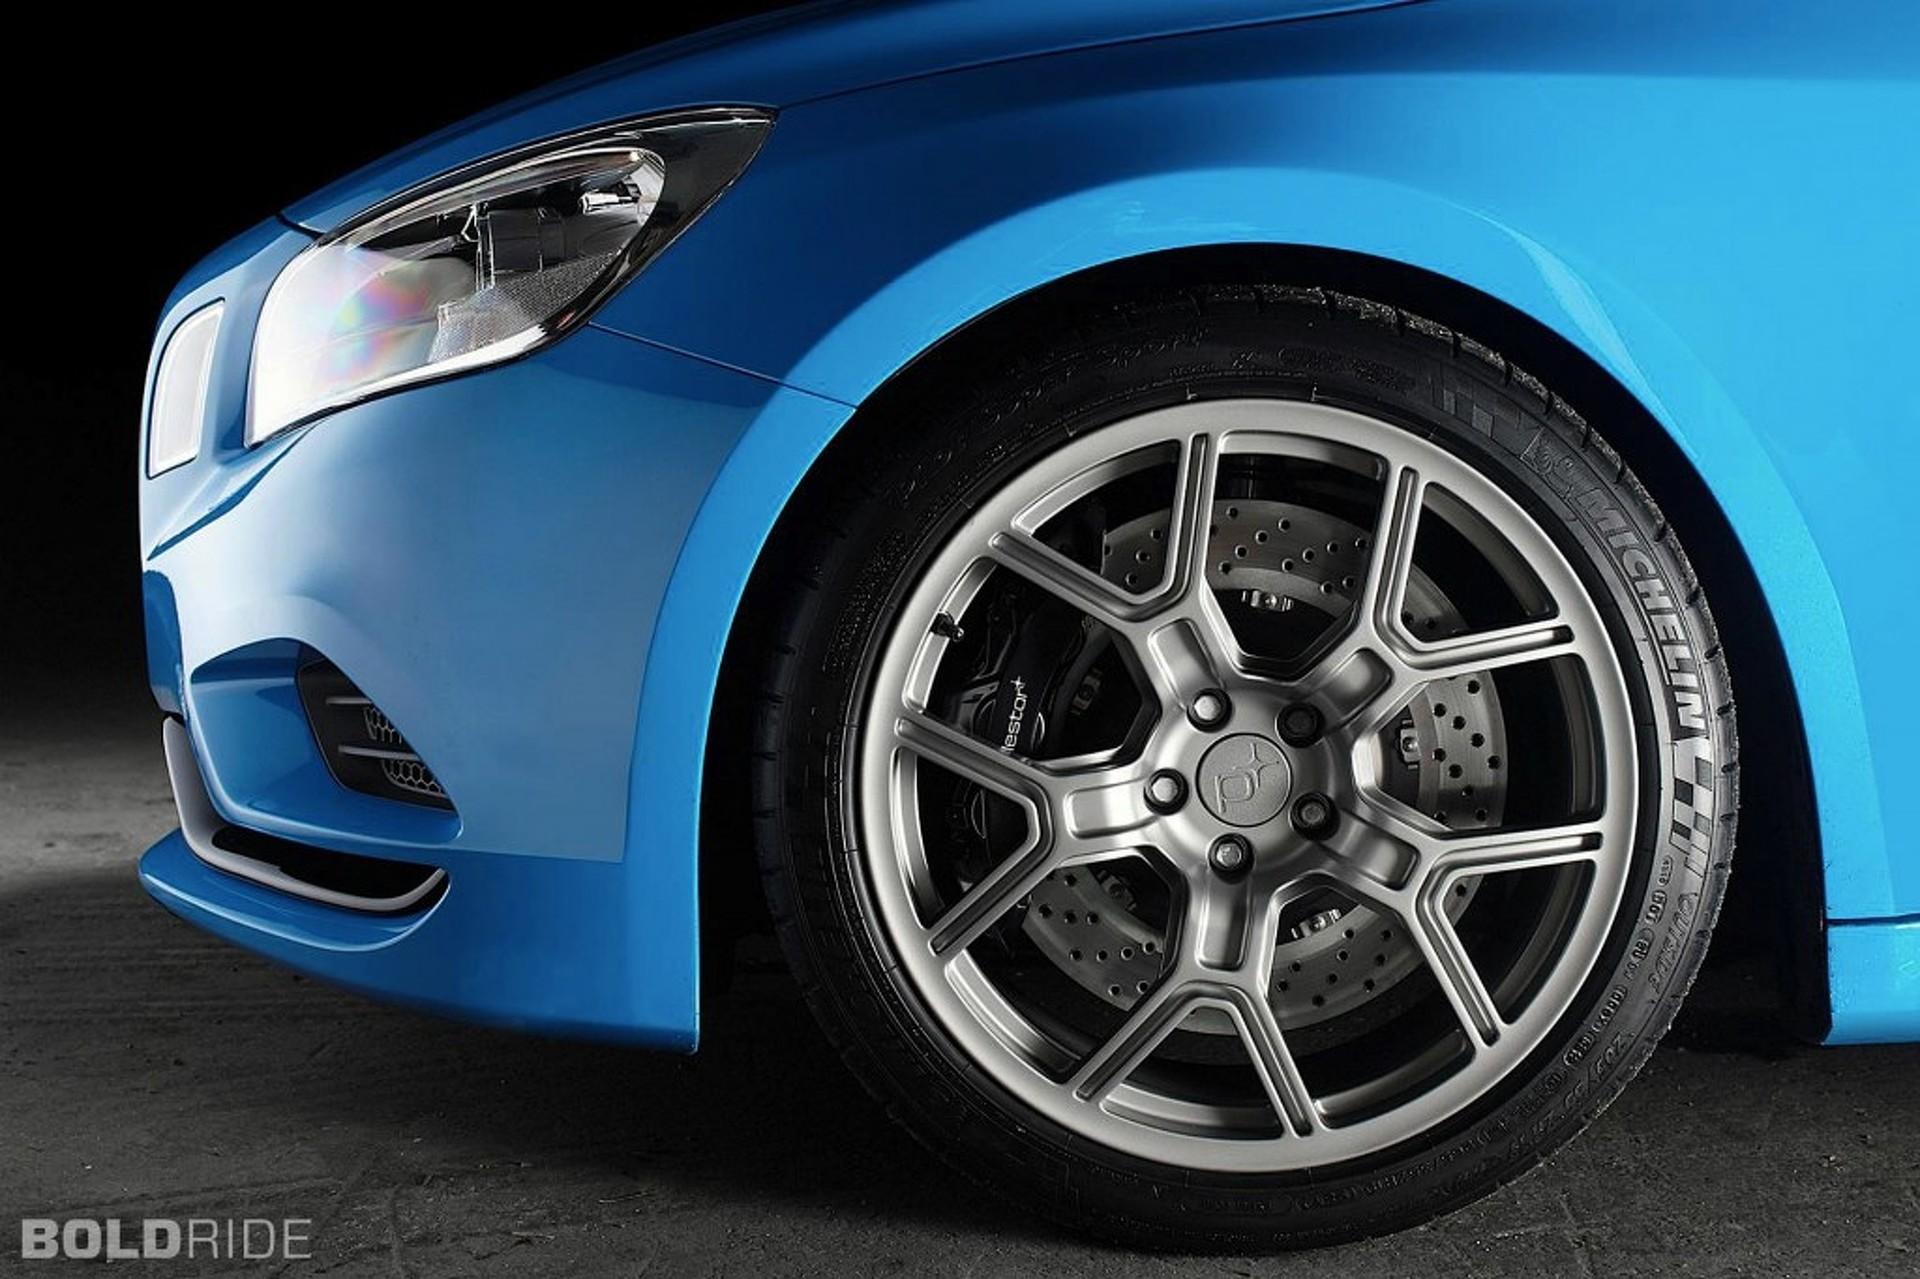 Unveiled: Volvo S60 Polestar Performance Concept